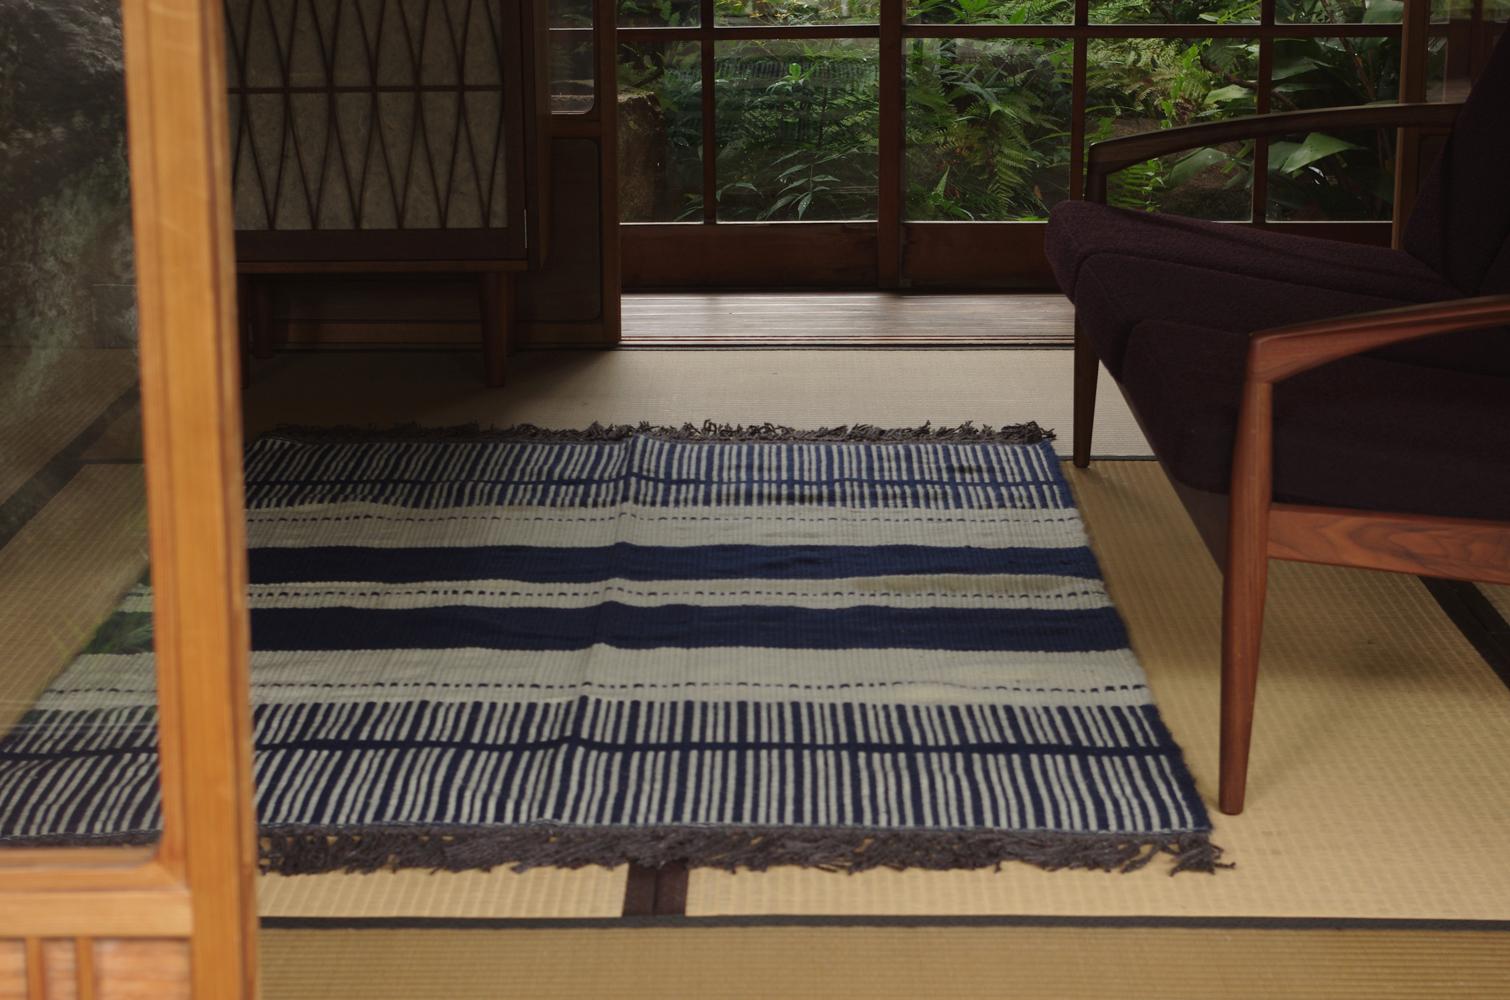 credenza diary hp online shop updated wool rug fabrica alentejana. Black Bedroom Furniture Sets. Home Design Ideas